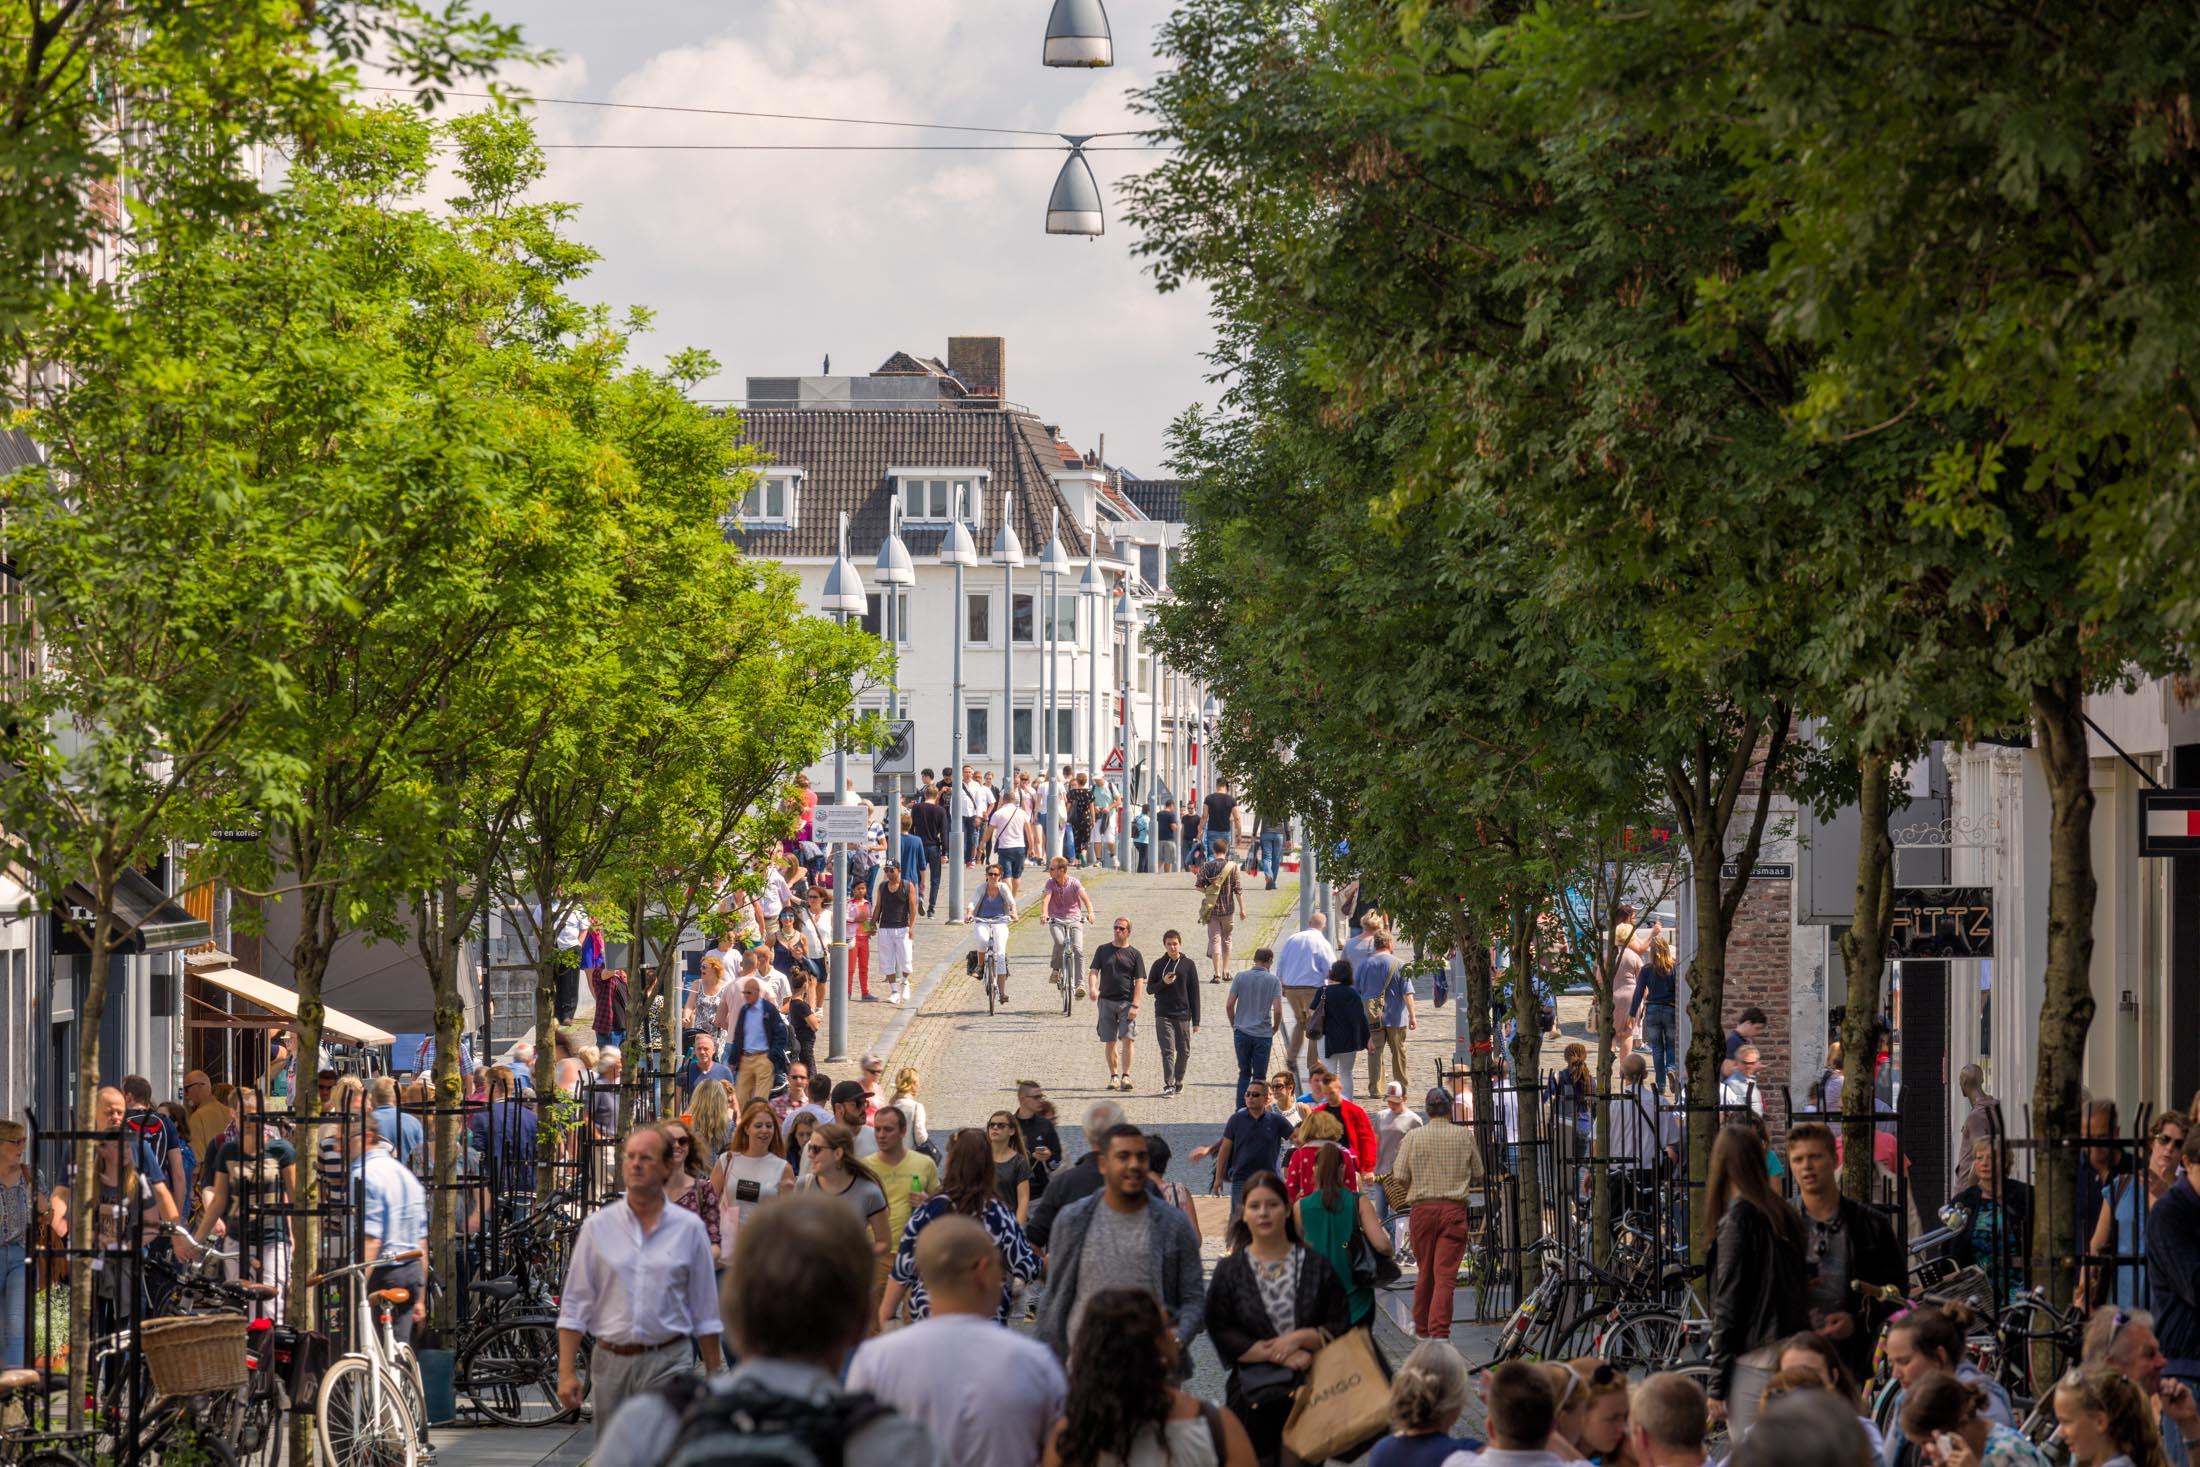 Maastricht-Maastrichter-Brugstraat-2.jpg